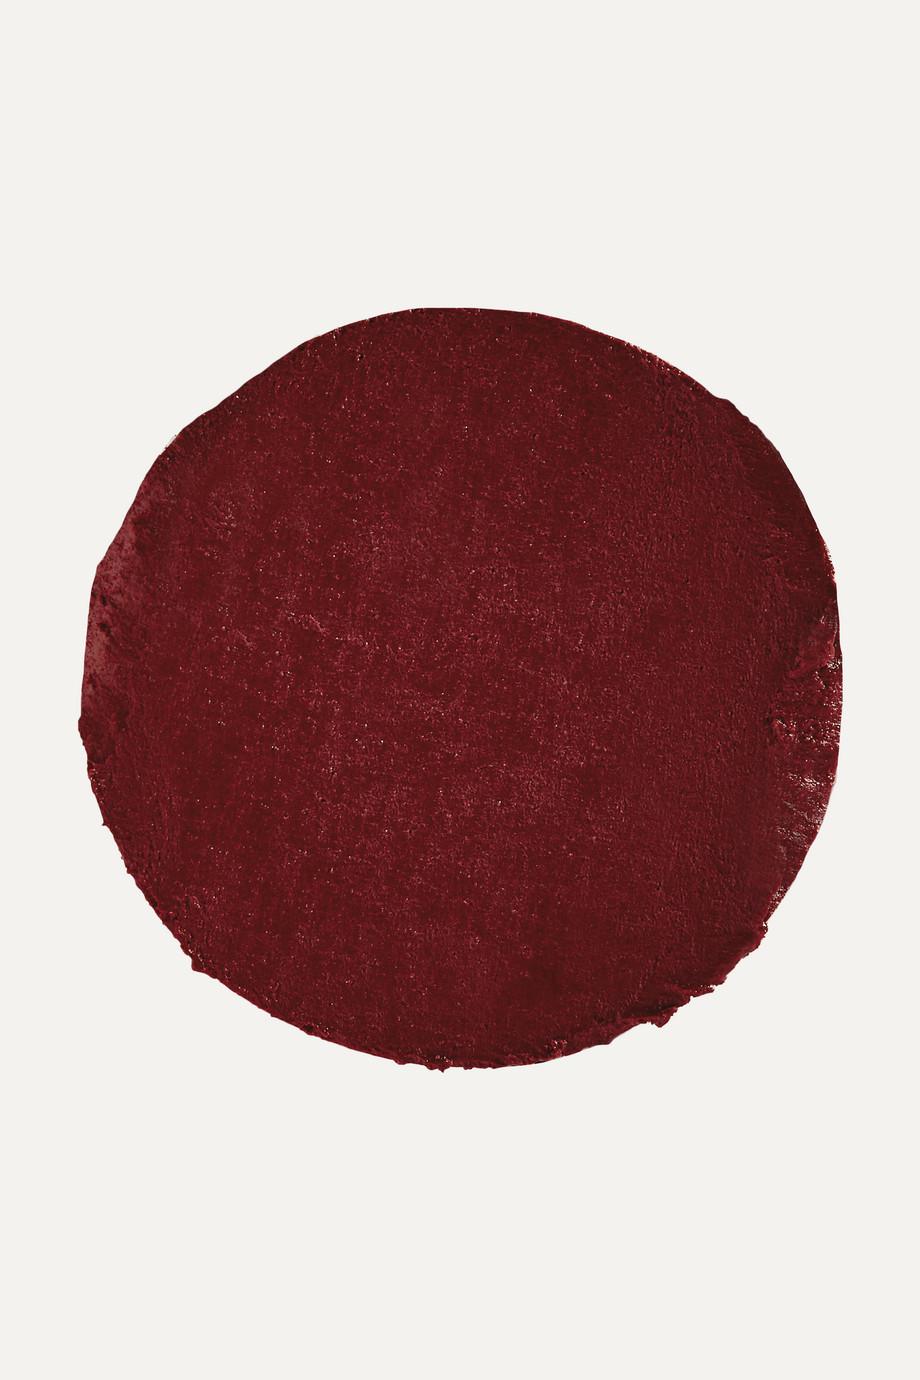 Christian Louboutin Beauty Velvet Matte Lip Colour - Djalouzi